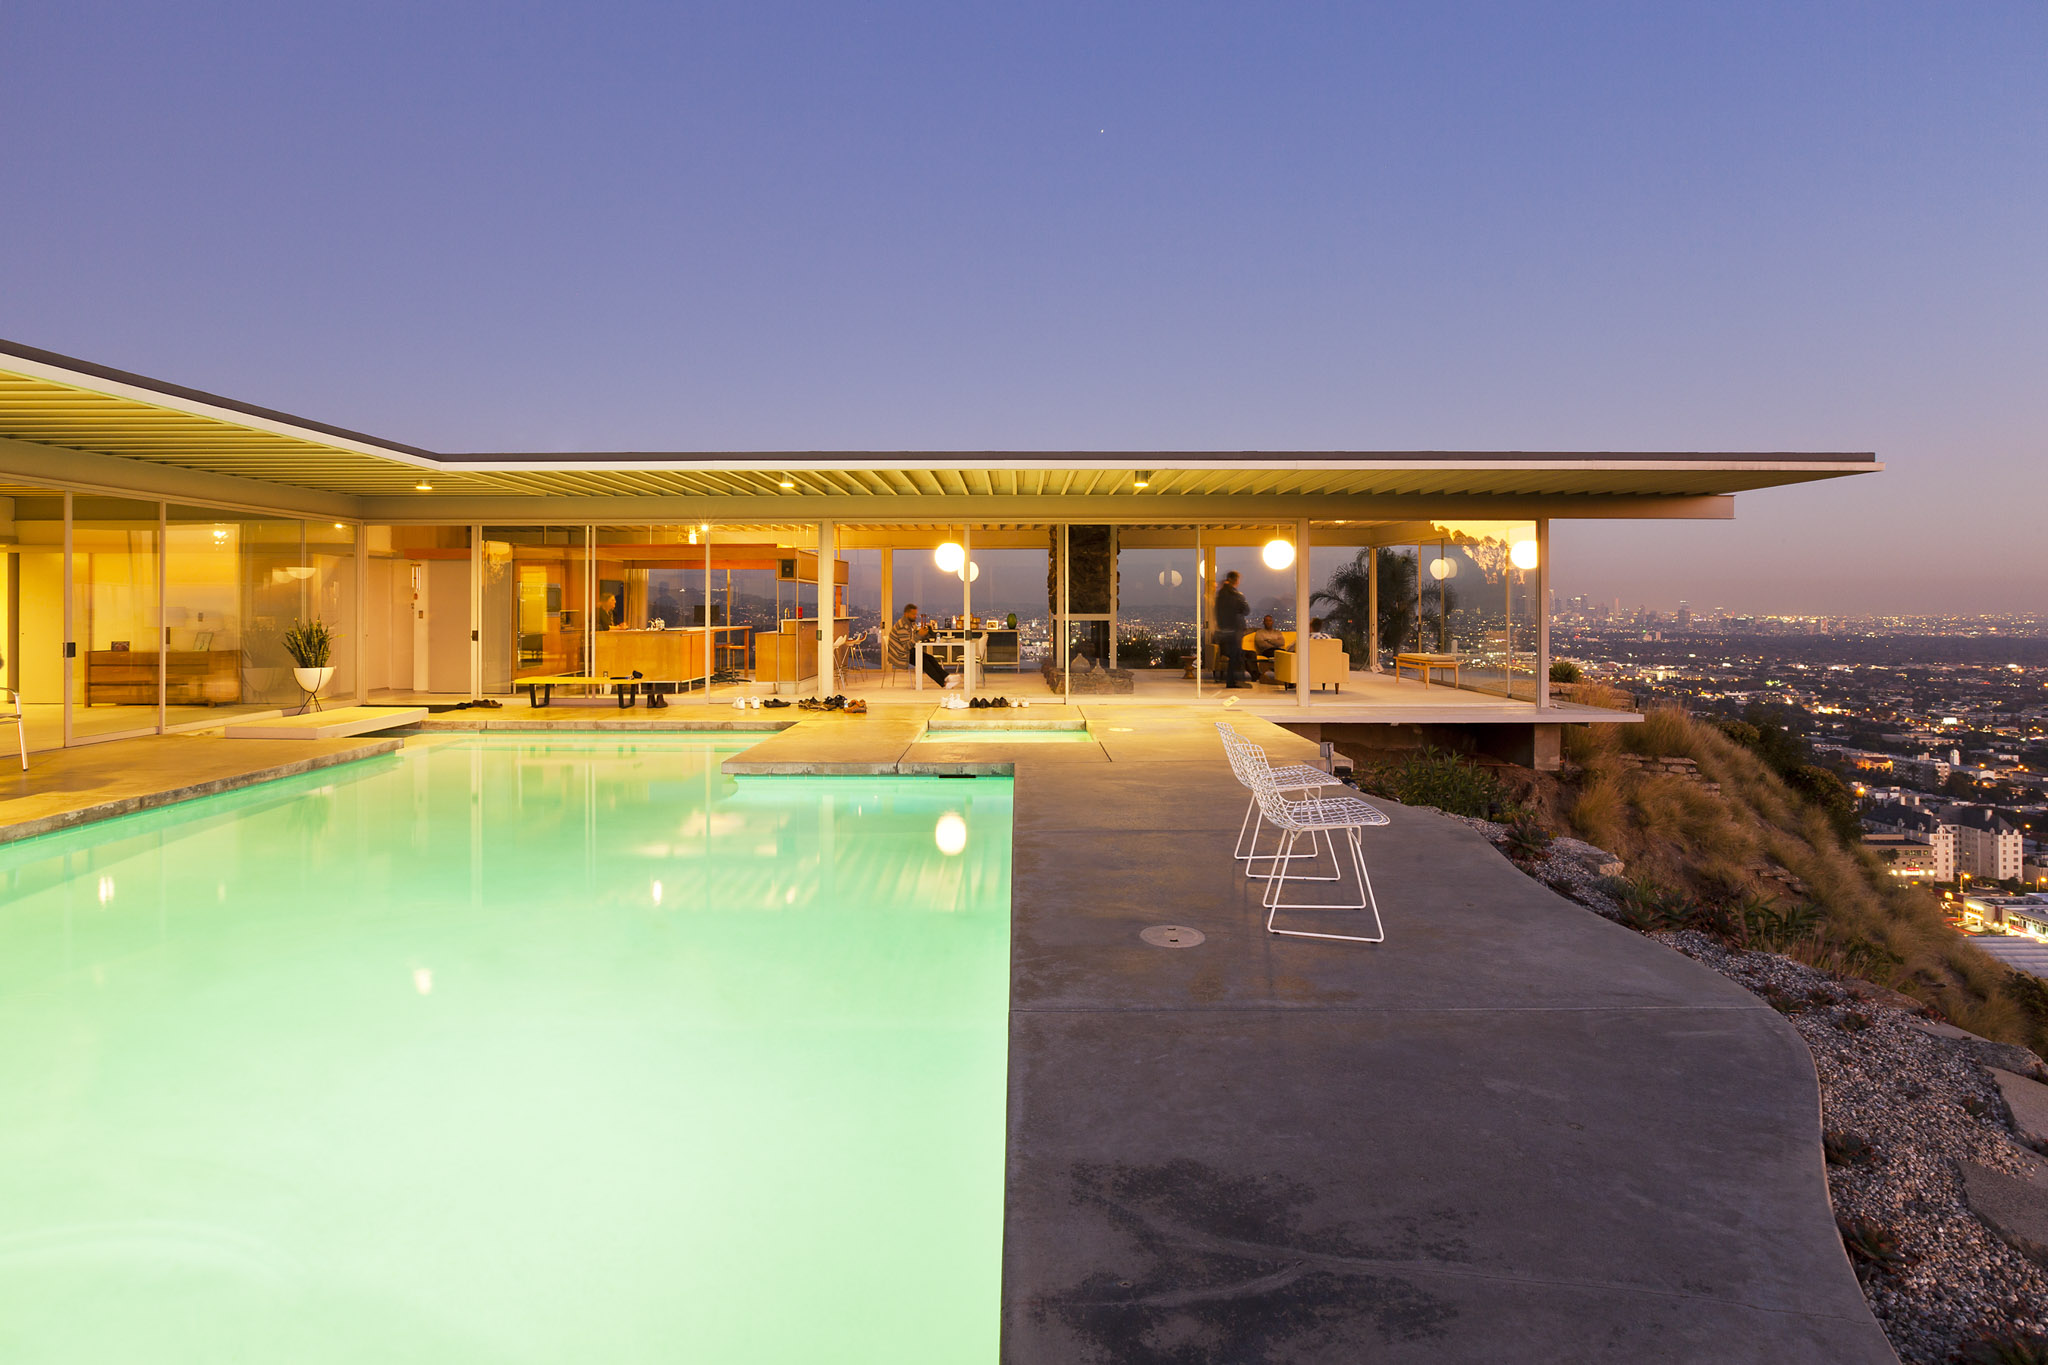 Stahl House by Pierre Koenig